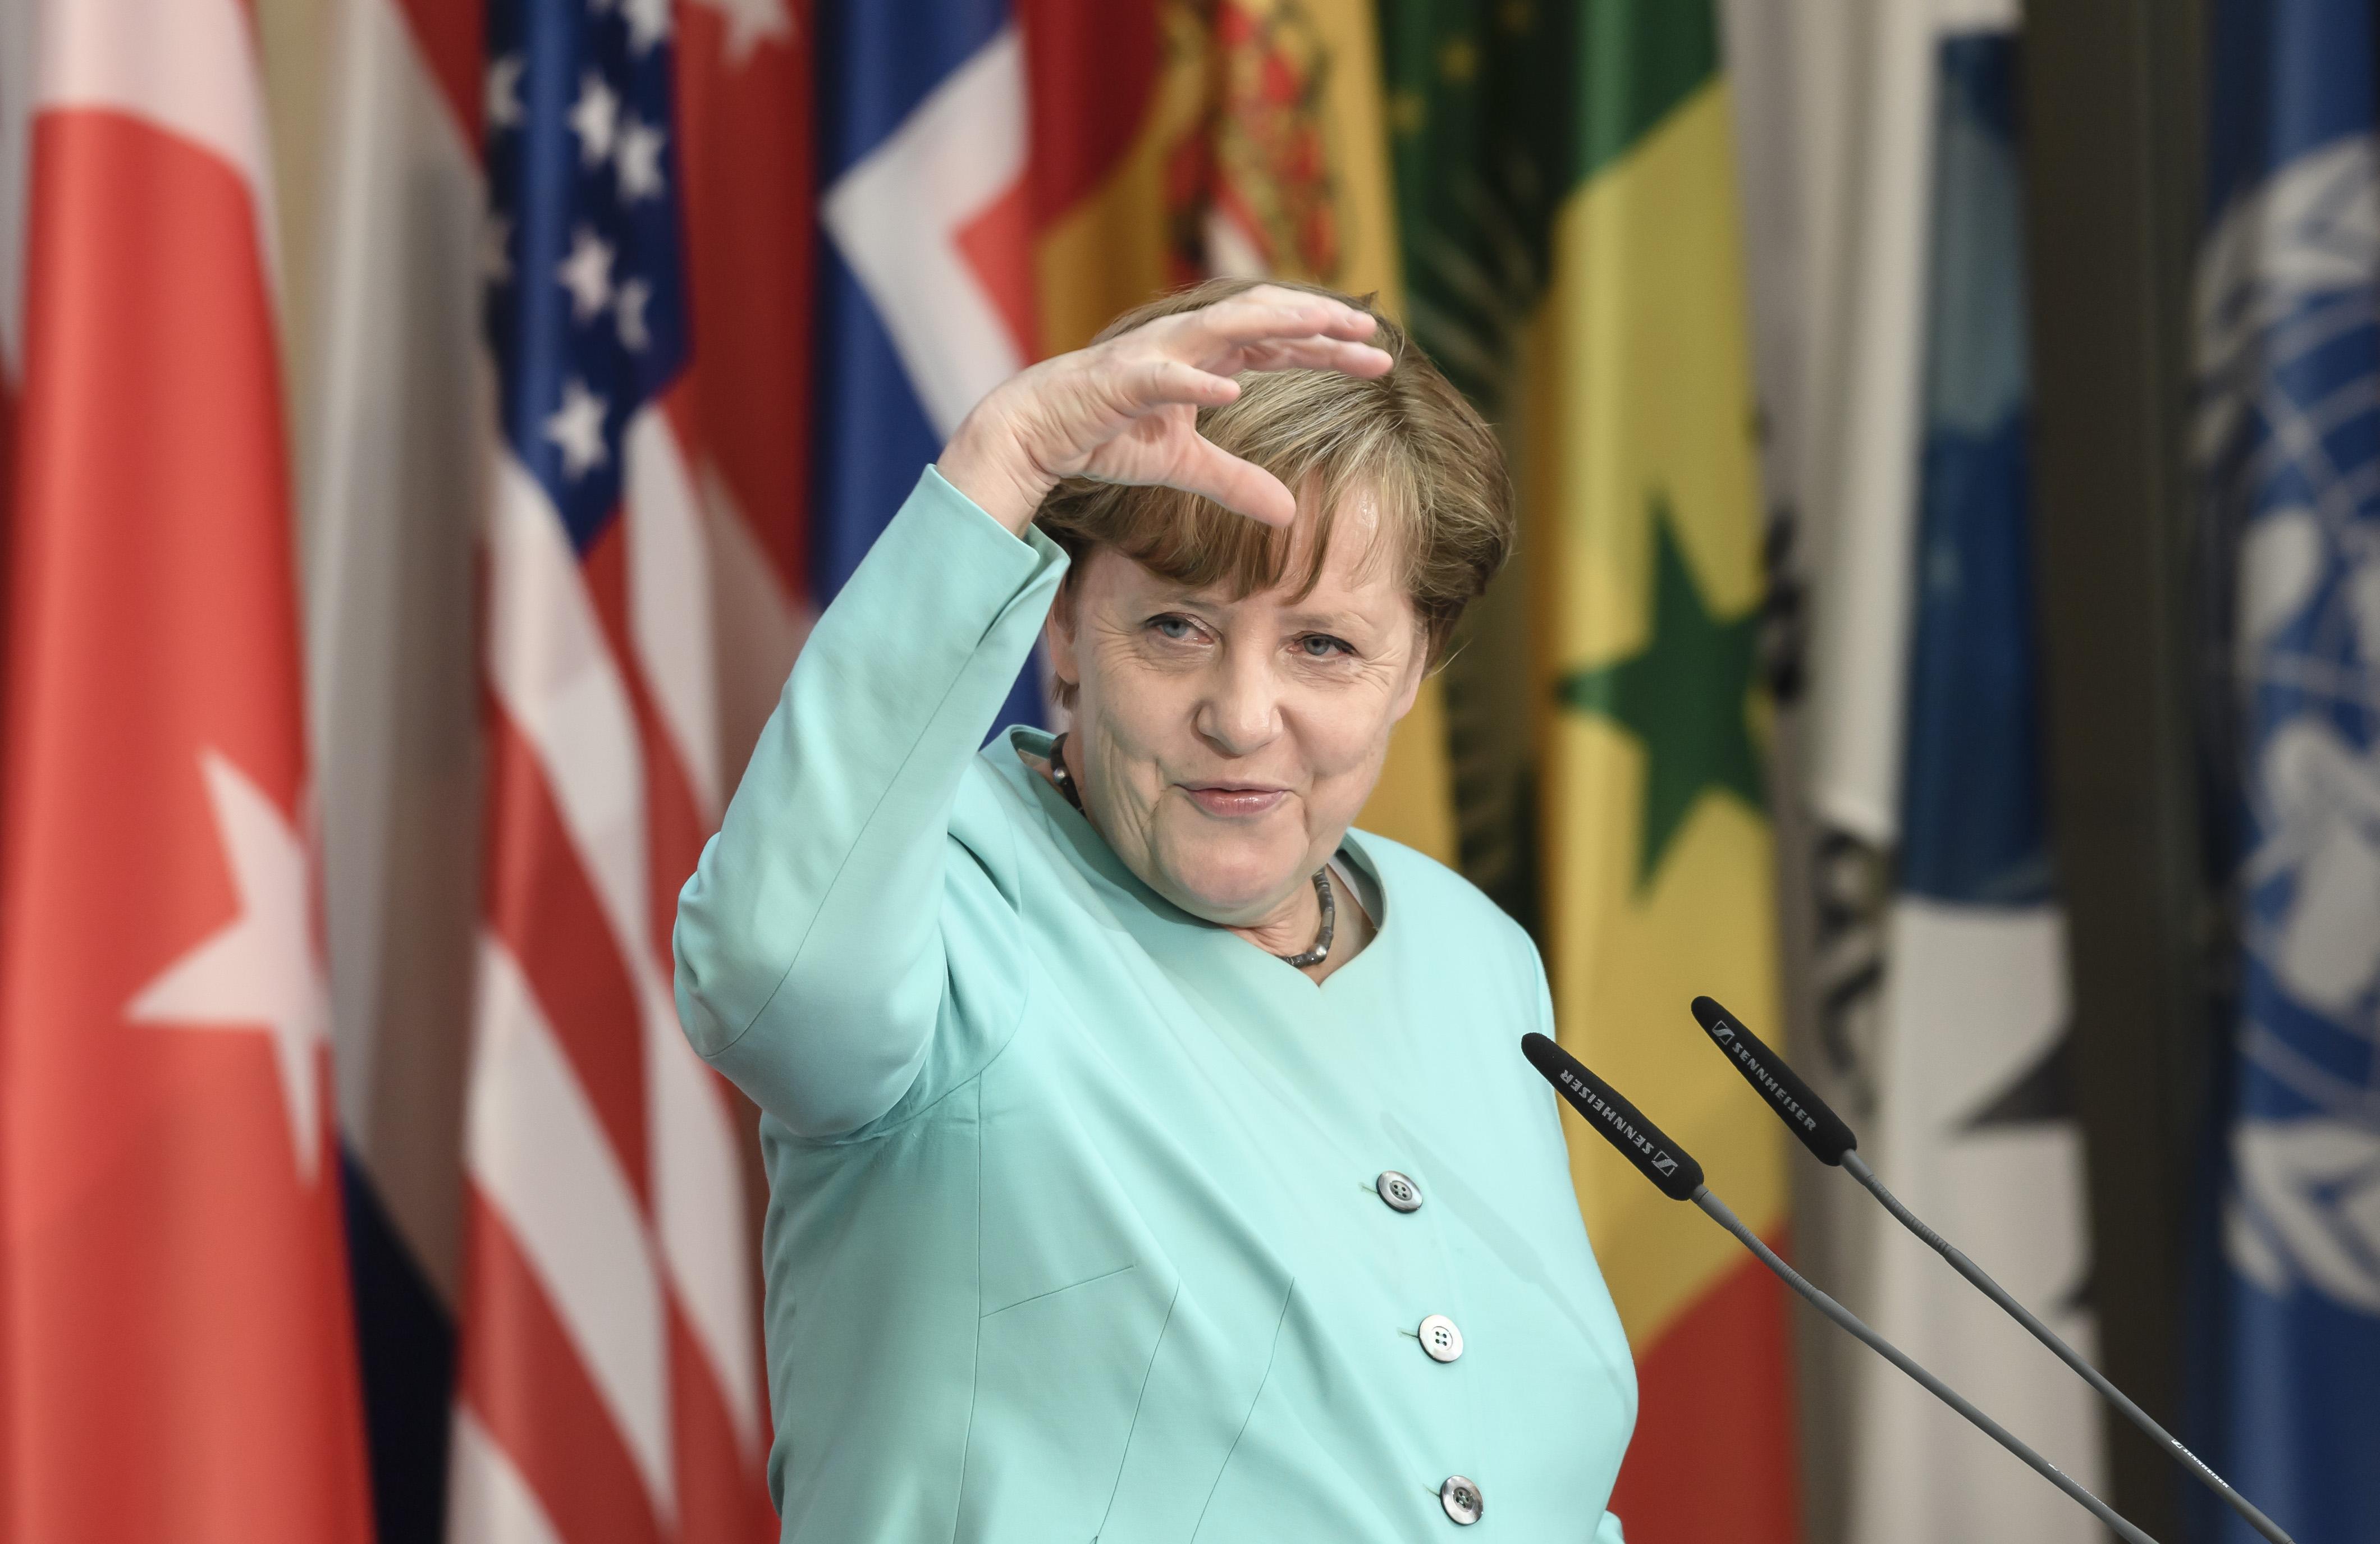 German Chancellor Angela Merkel speaks during the G20 Health Minister's Meeting in Berlin, Germany, 19 May 2017.